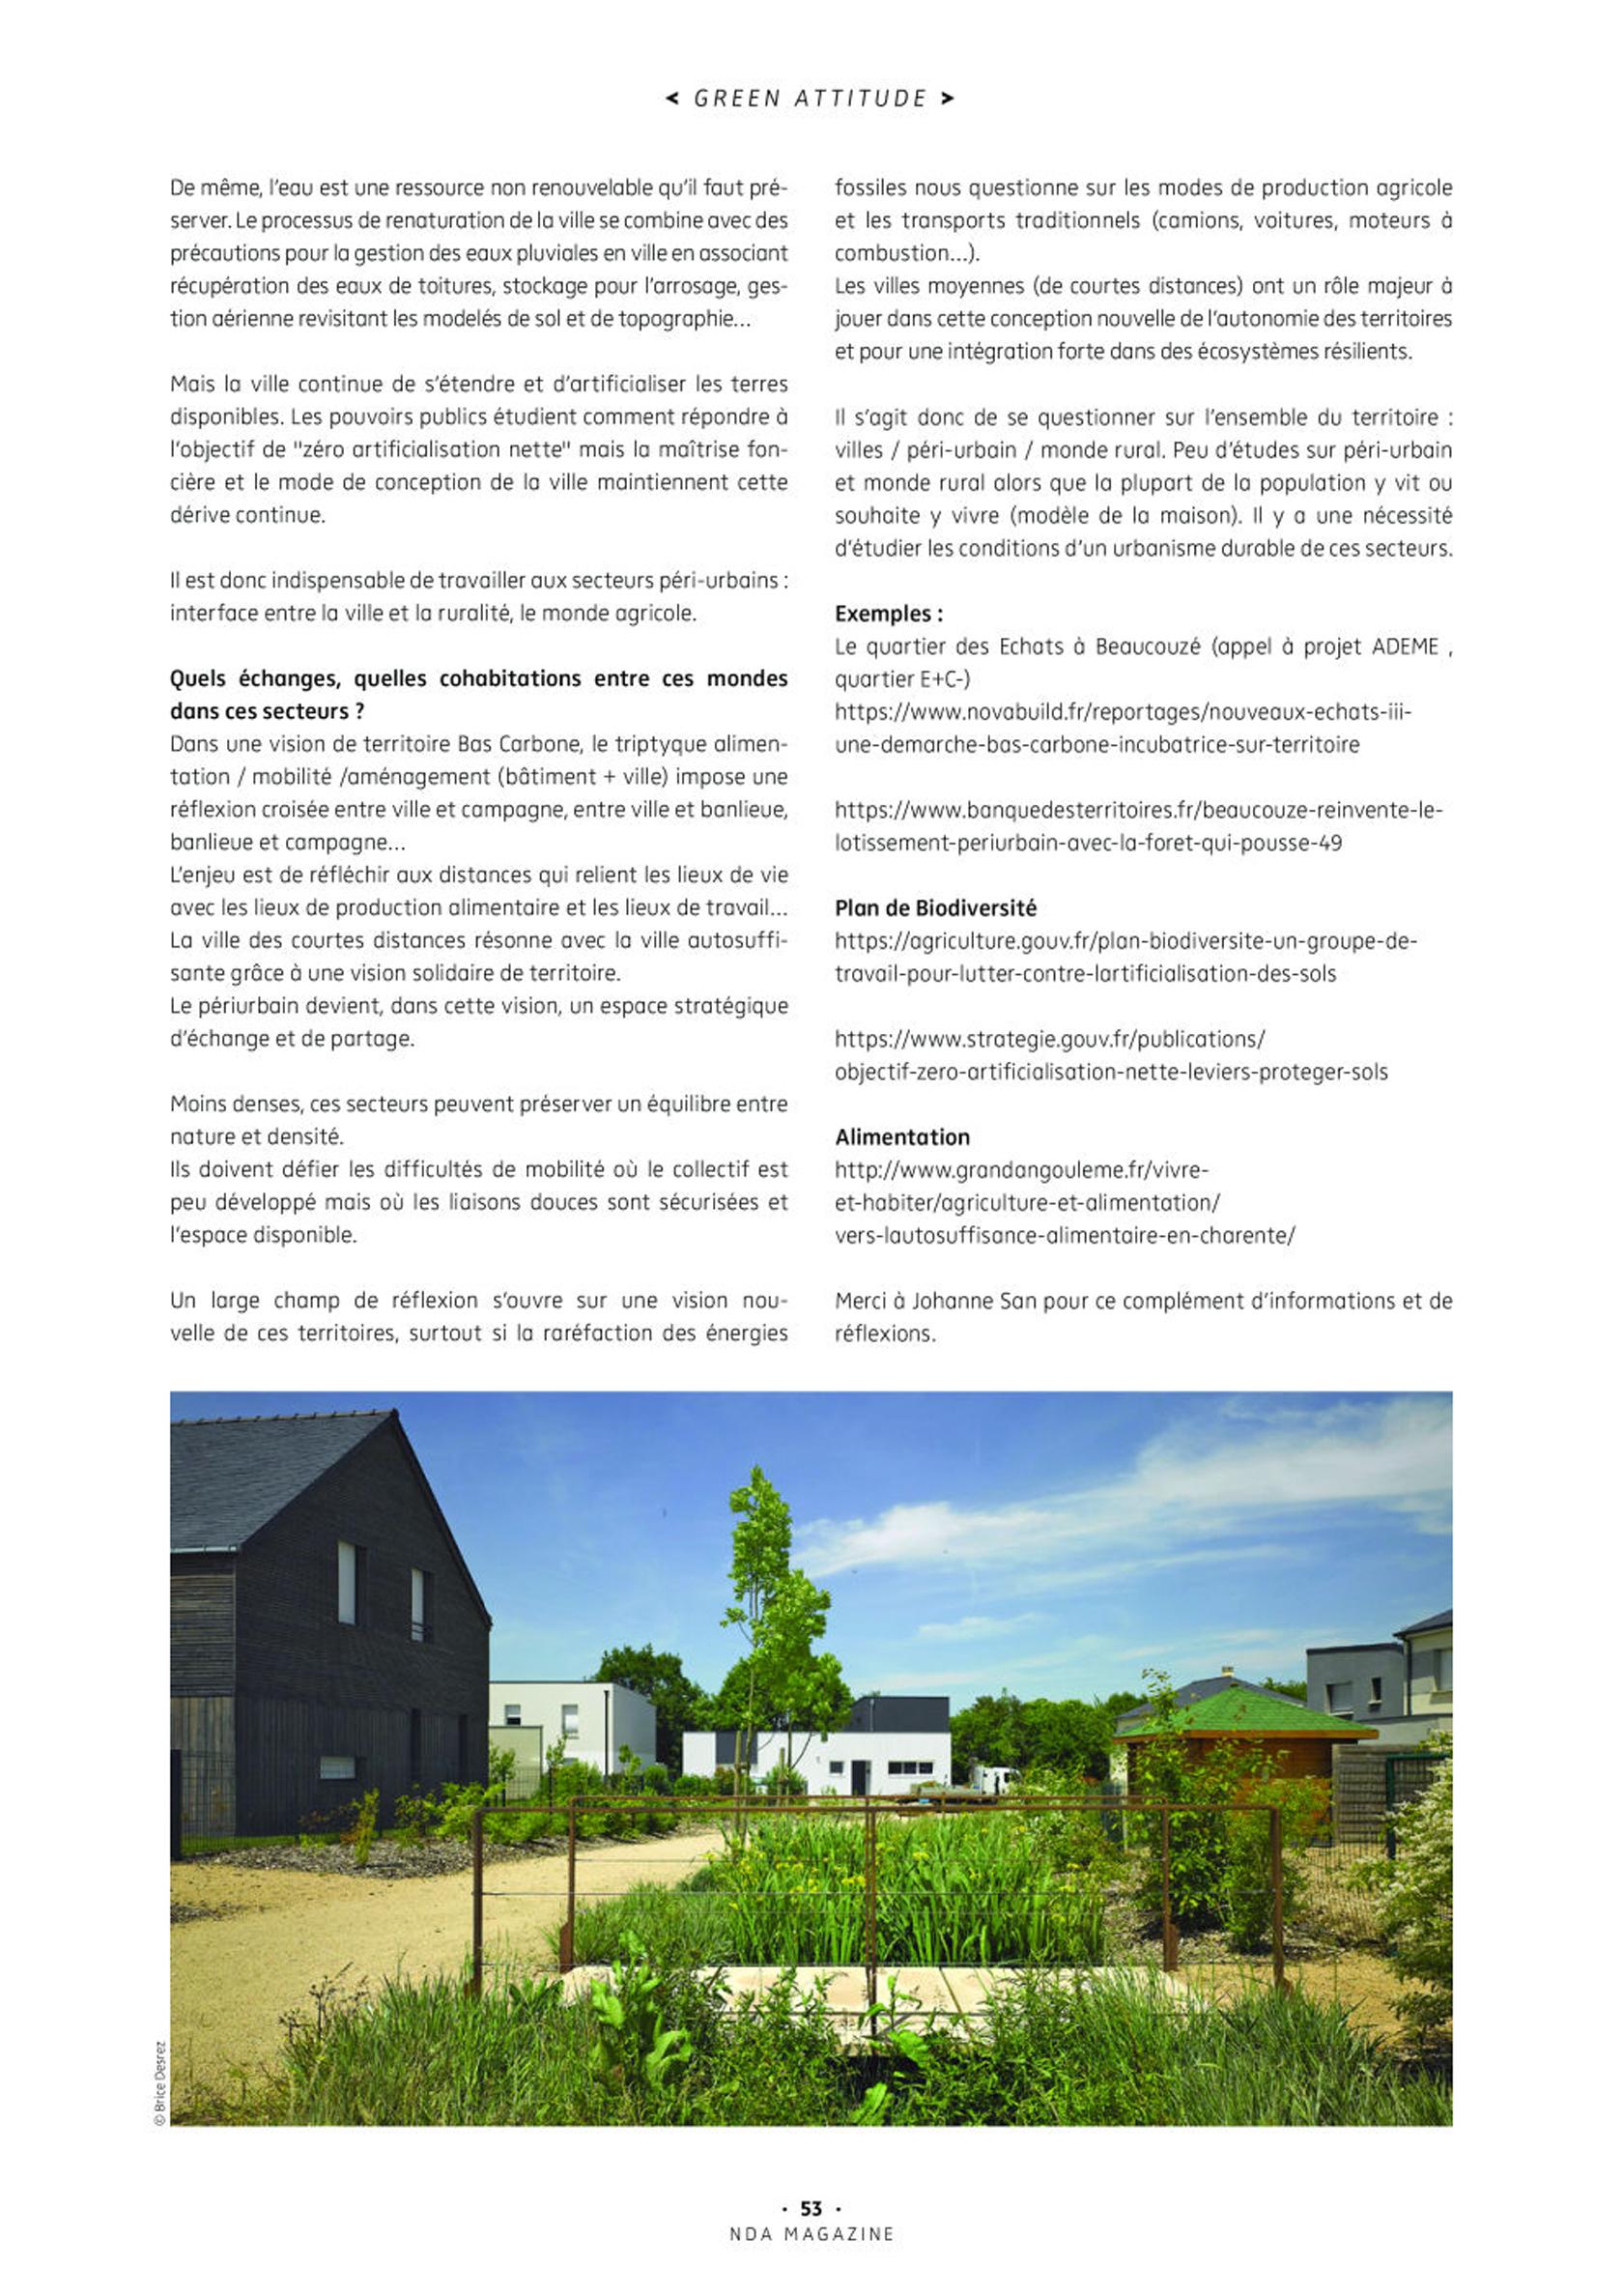 Agence Johanne San - Architecture & Urbanisme